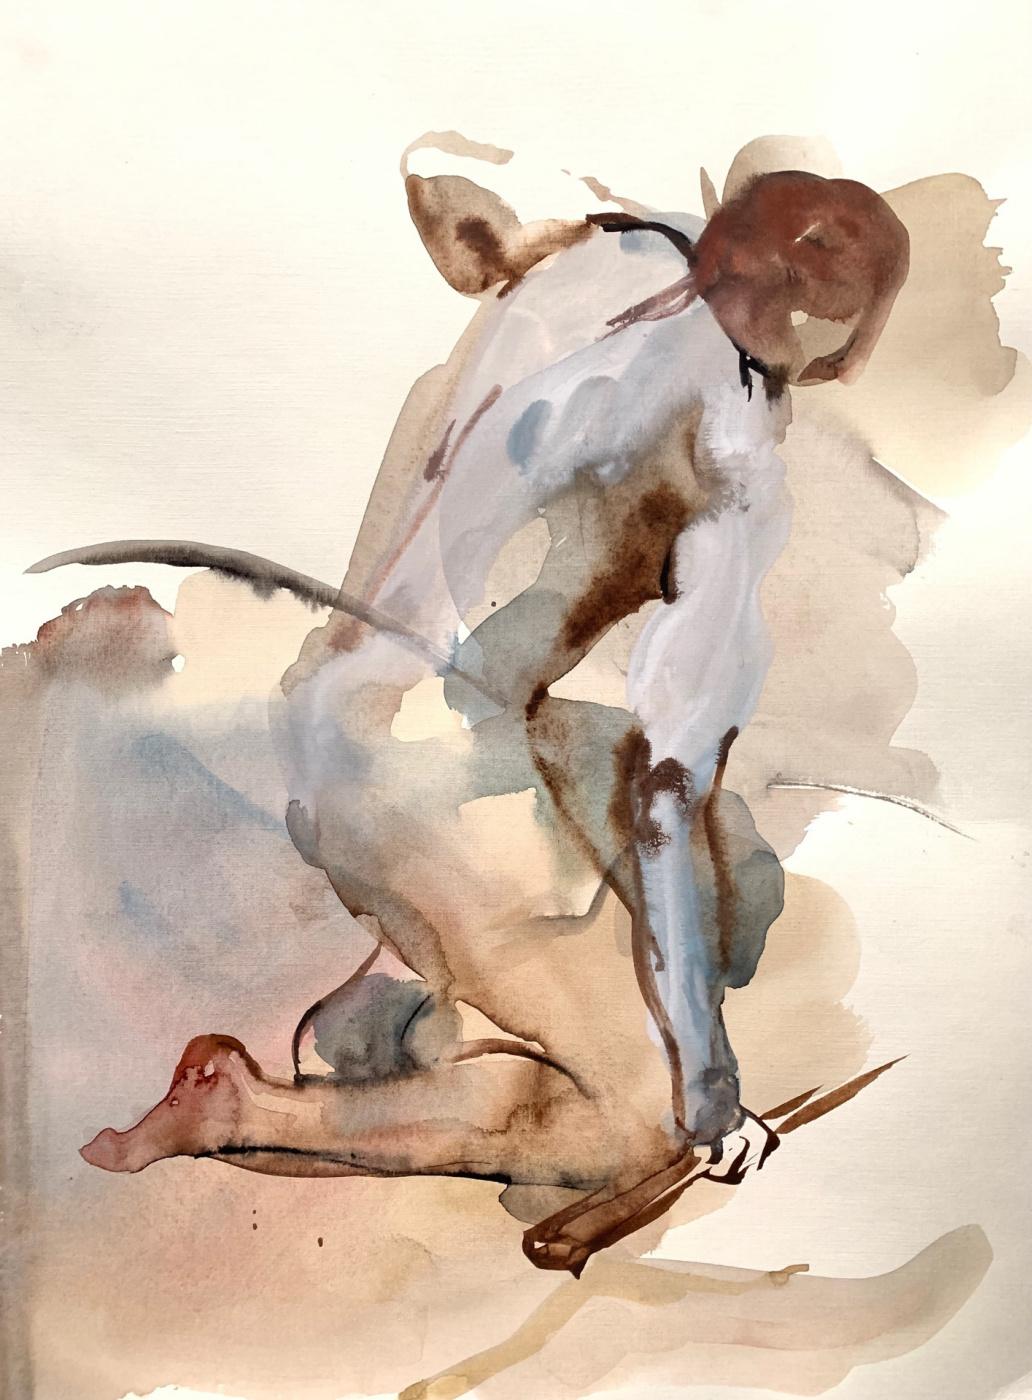 Юлия Неронска. Nude series